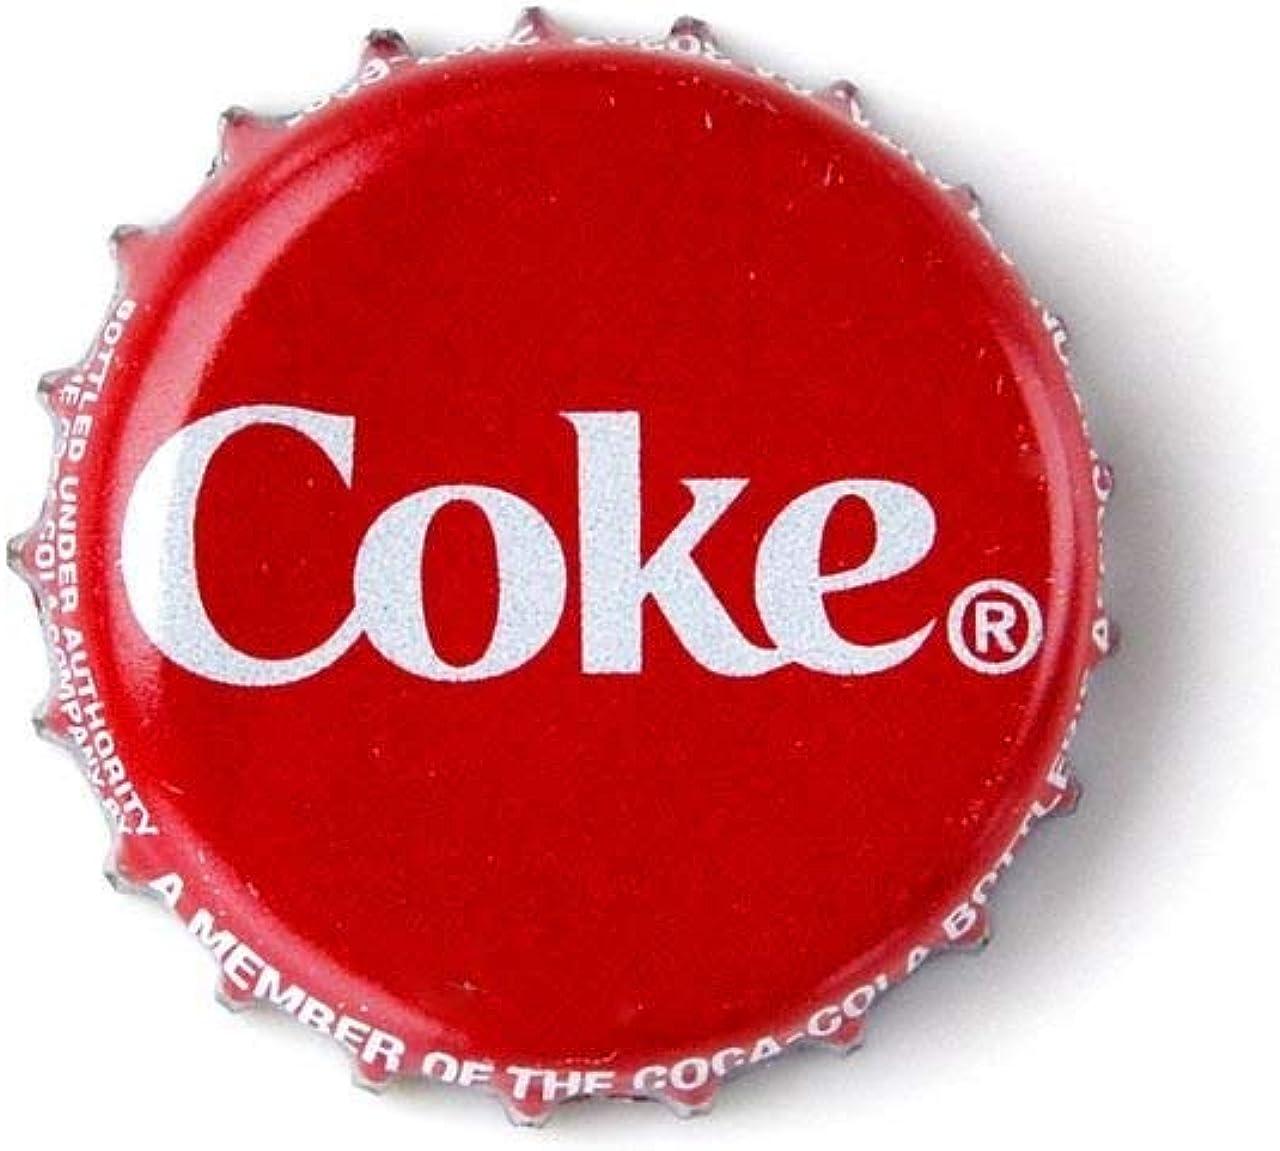 Quality Handcrafts Guaranteed Coke Bottle Cap Lapel Pin